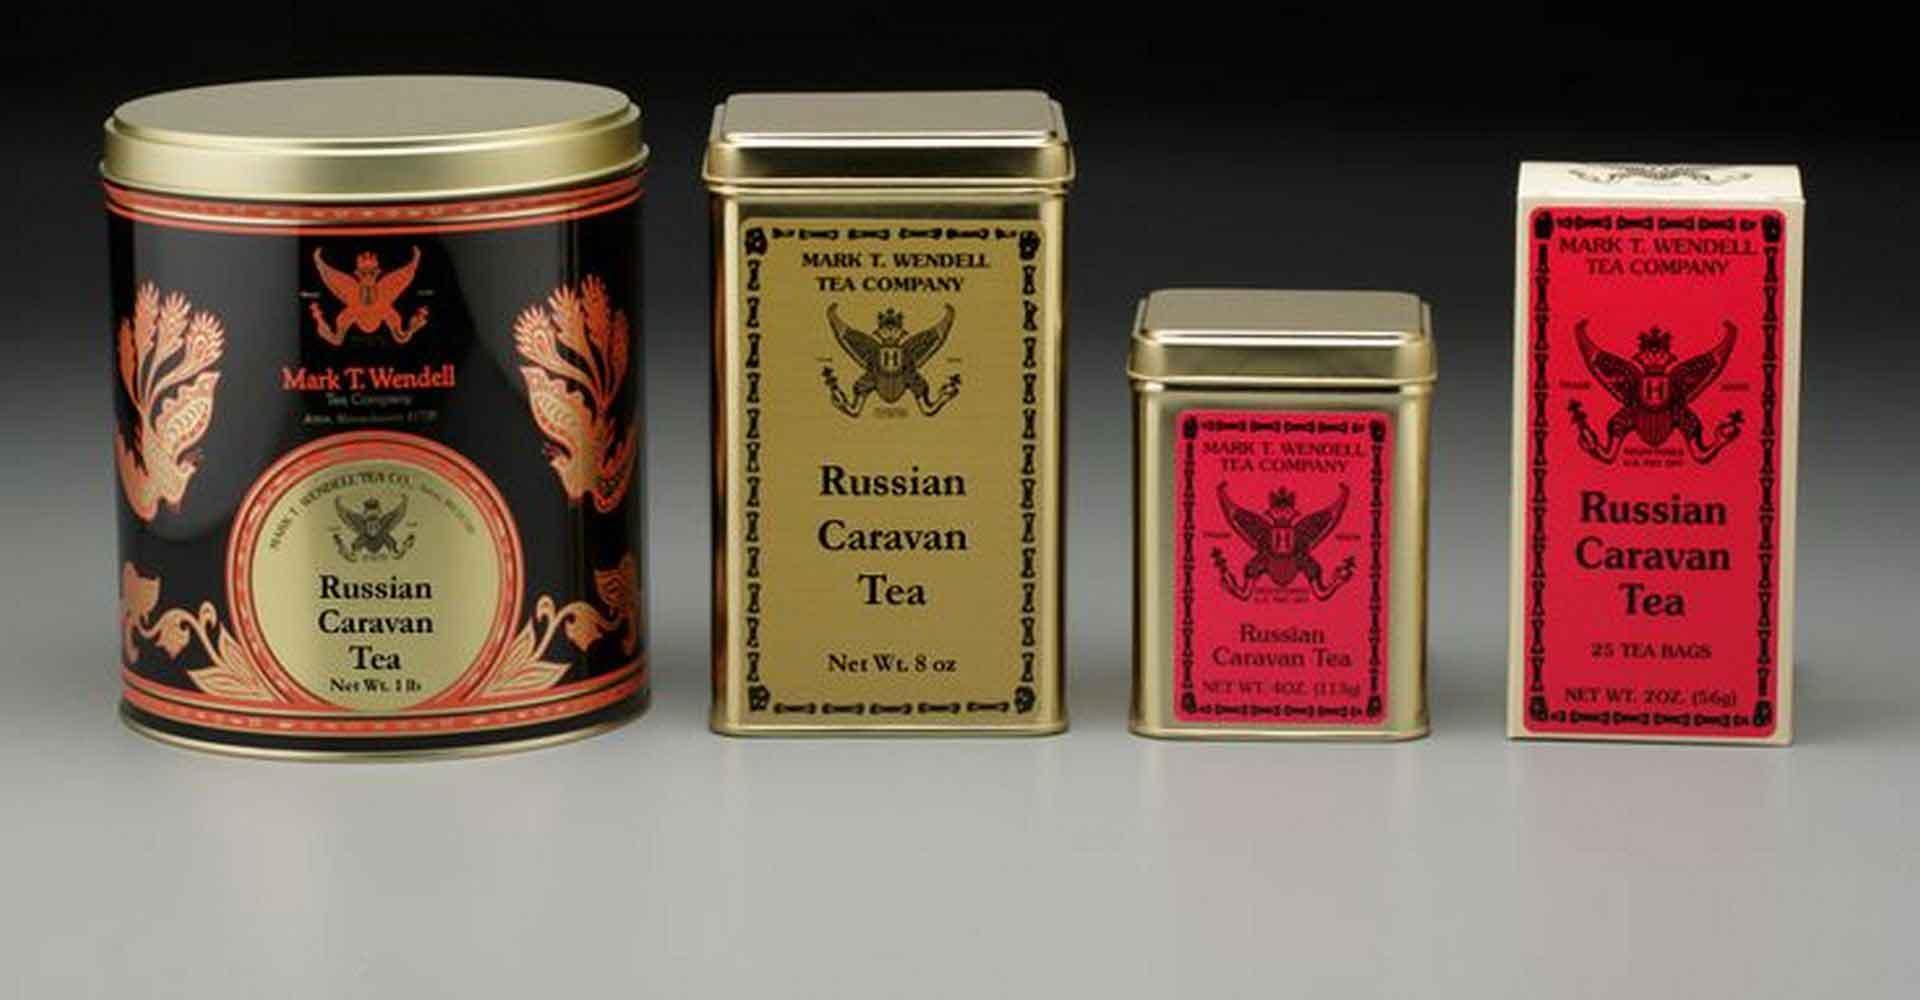 русский караван чай